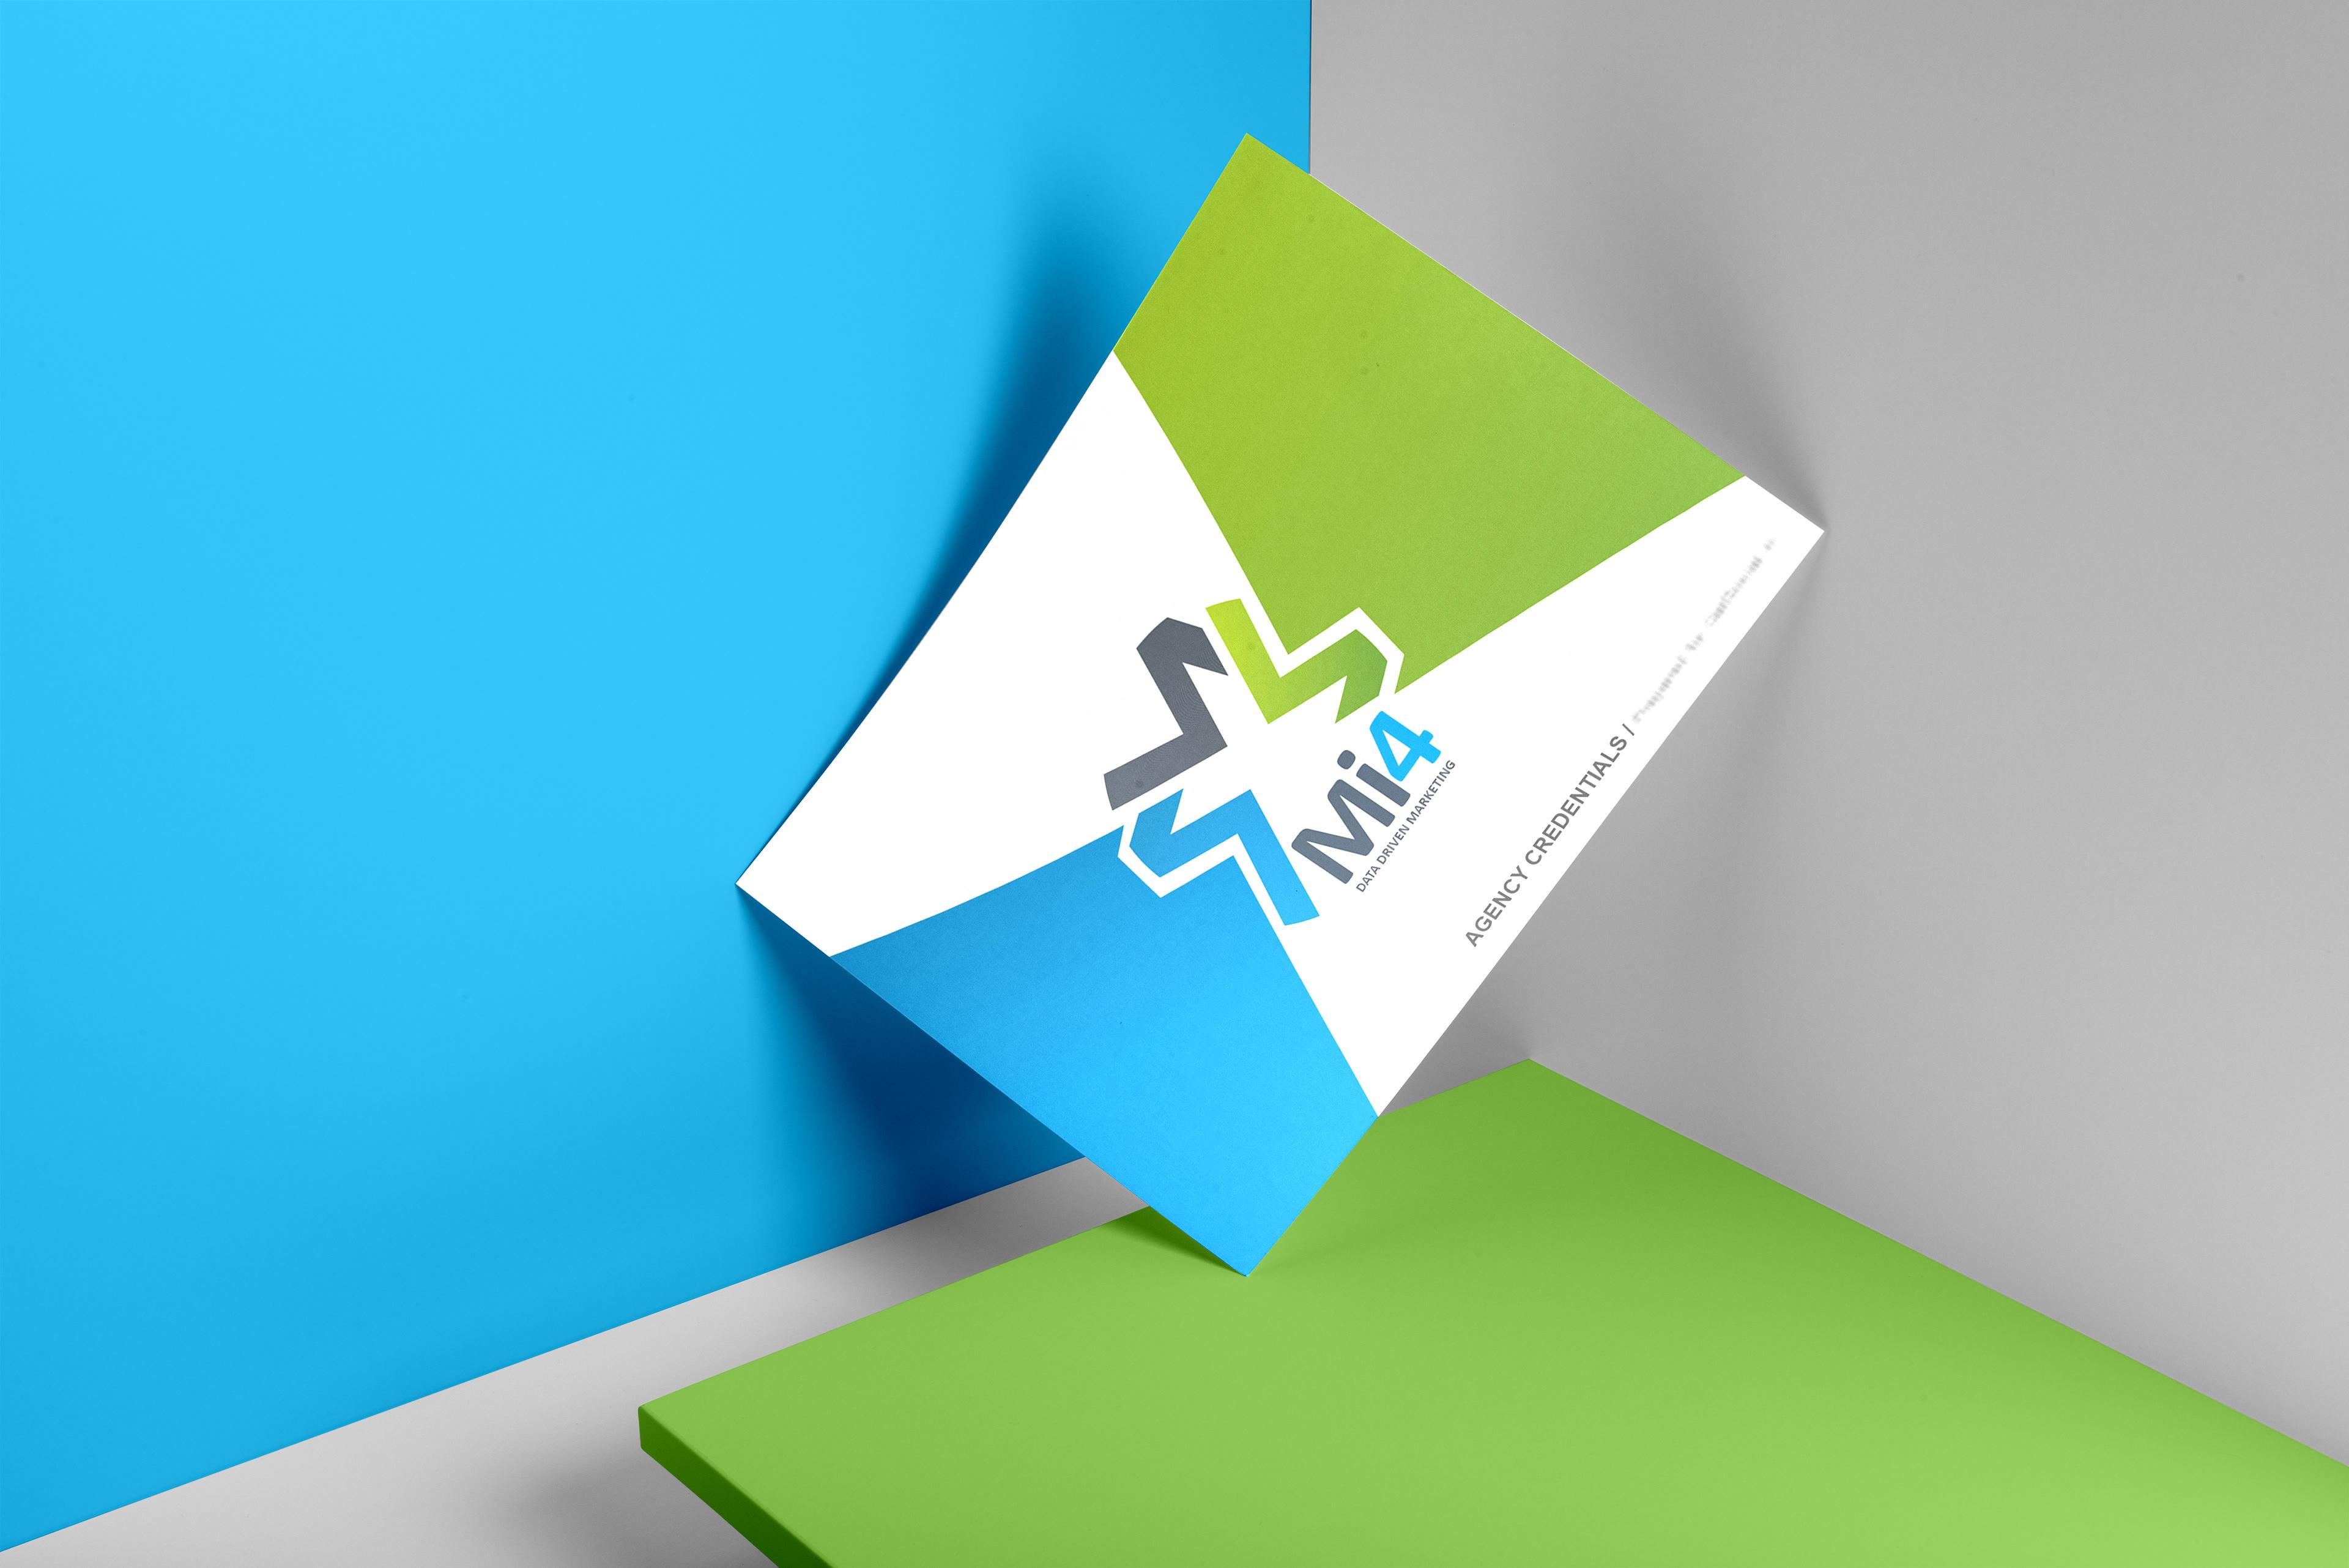 editable presentation template design mi4 france